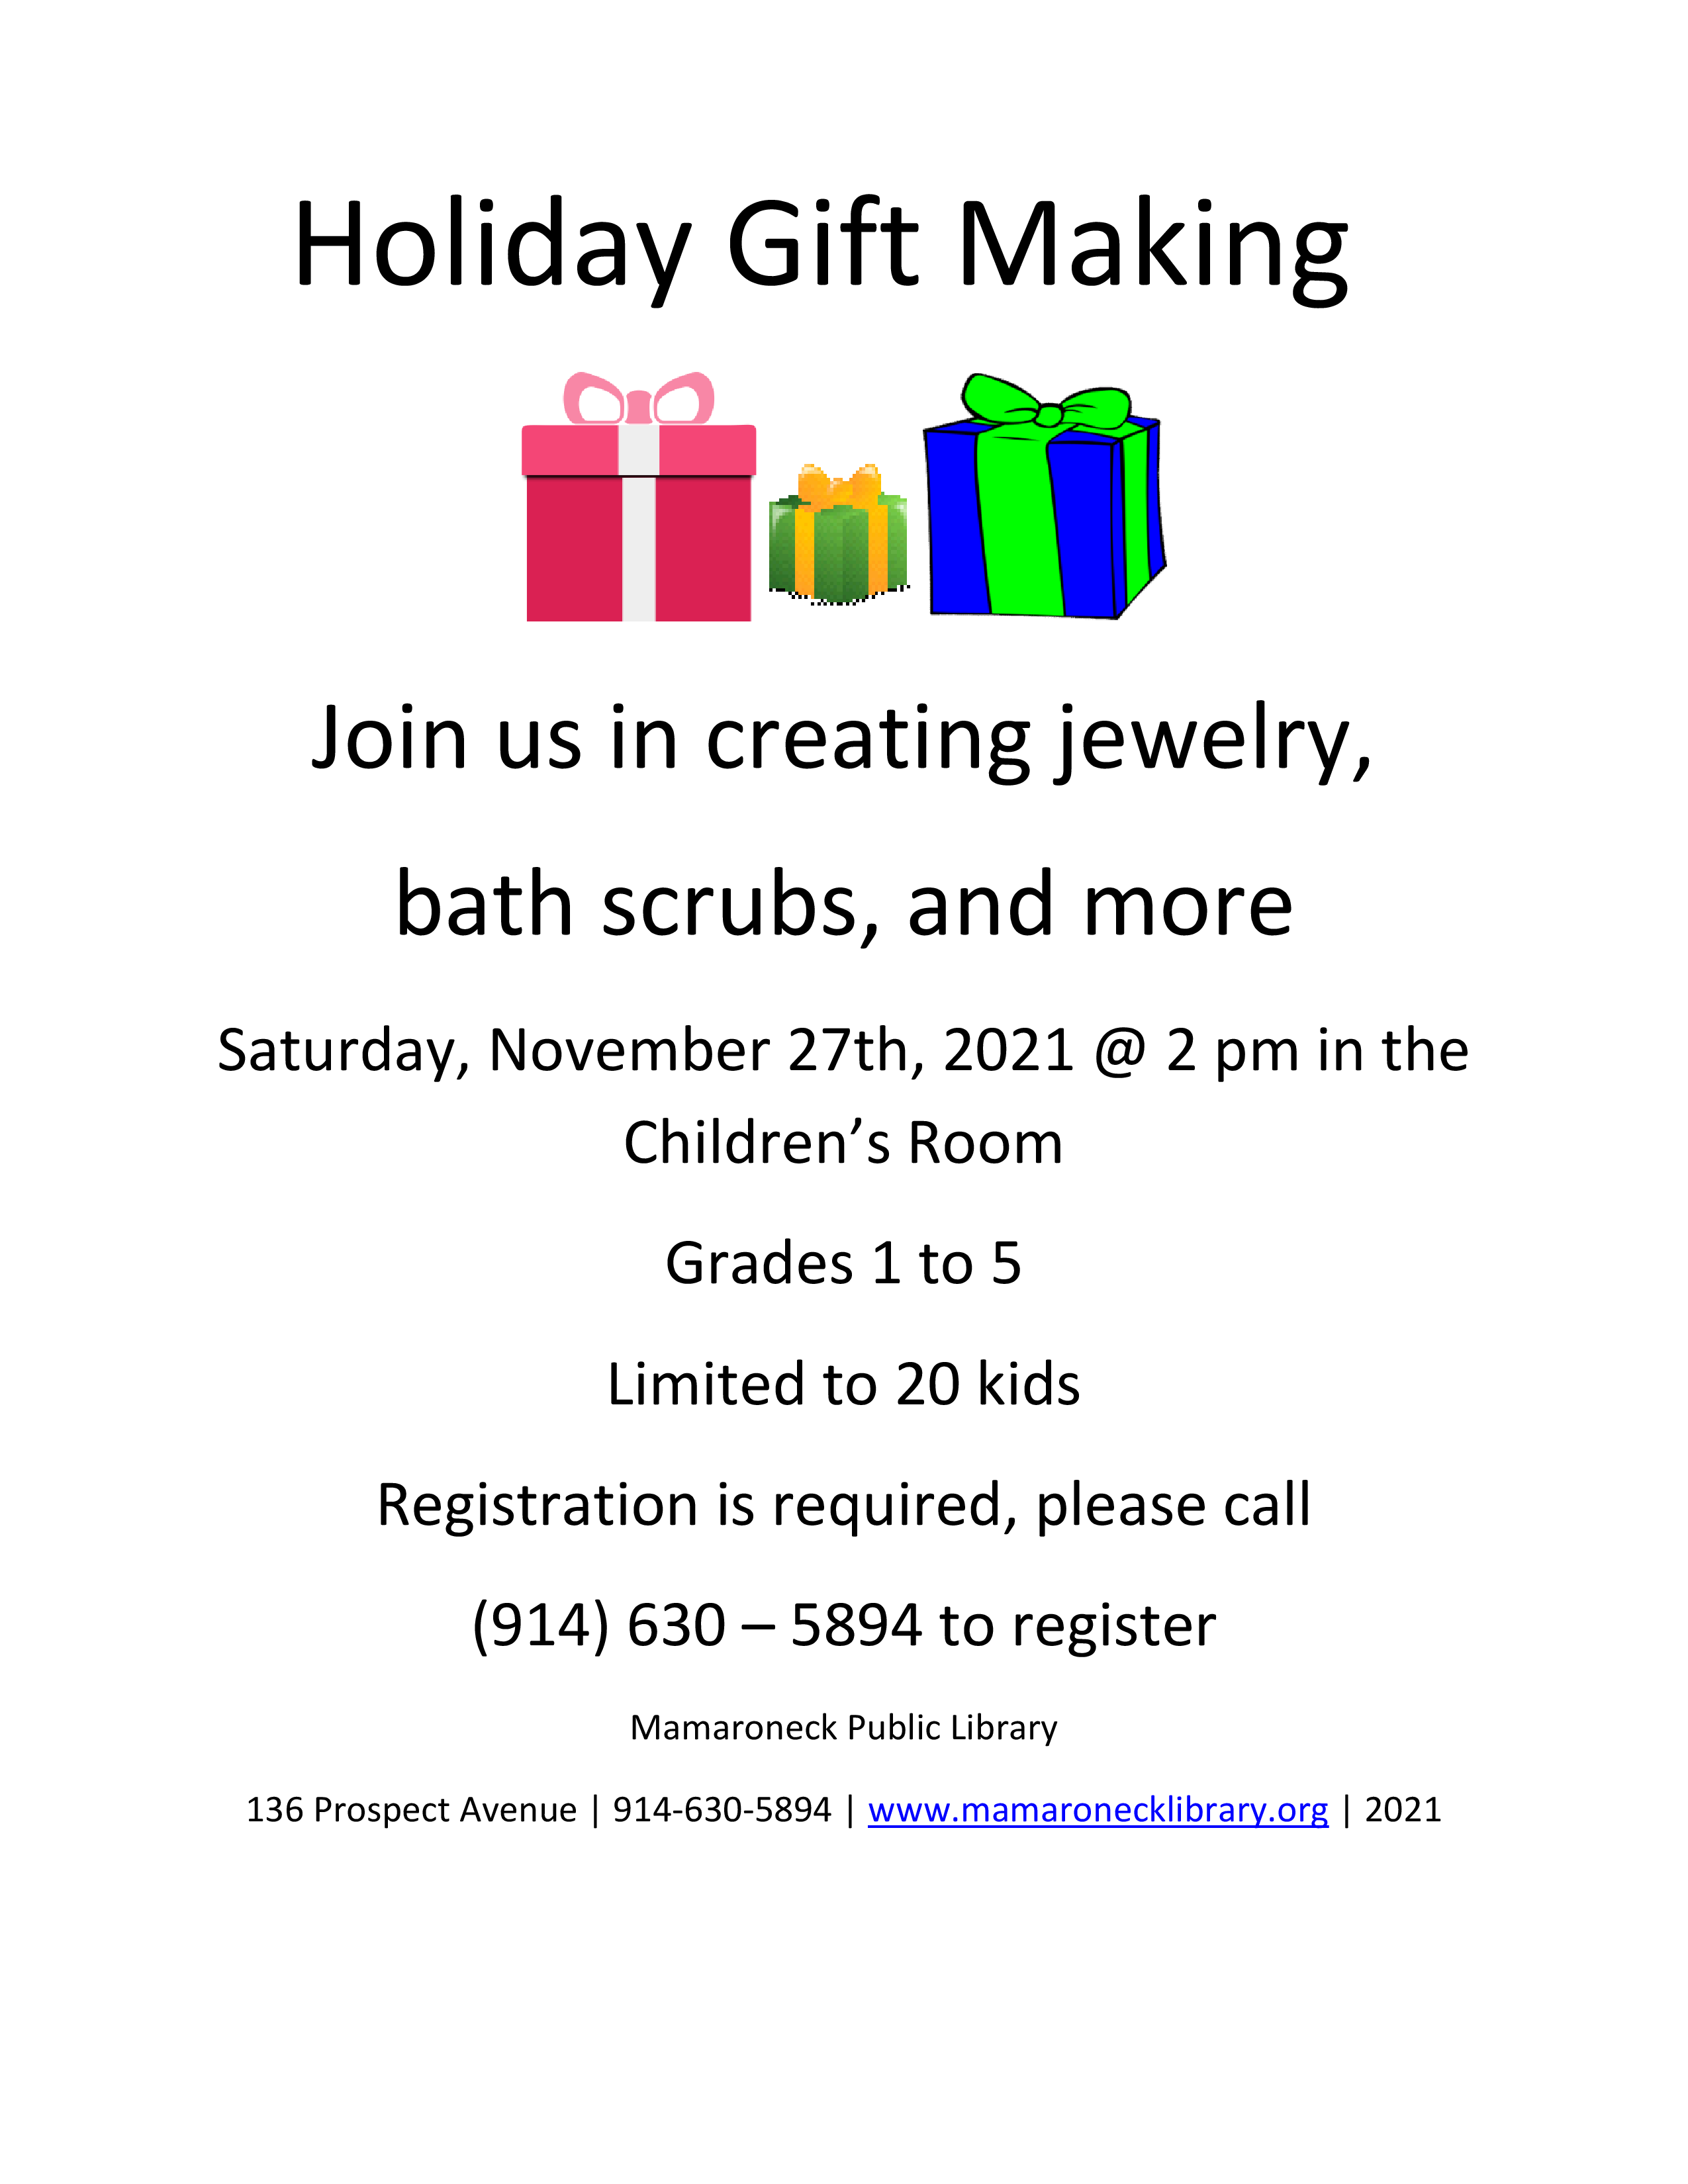 Holiday gift making Chicldren grades 1-5